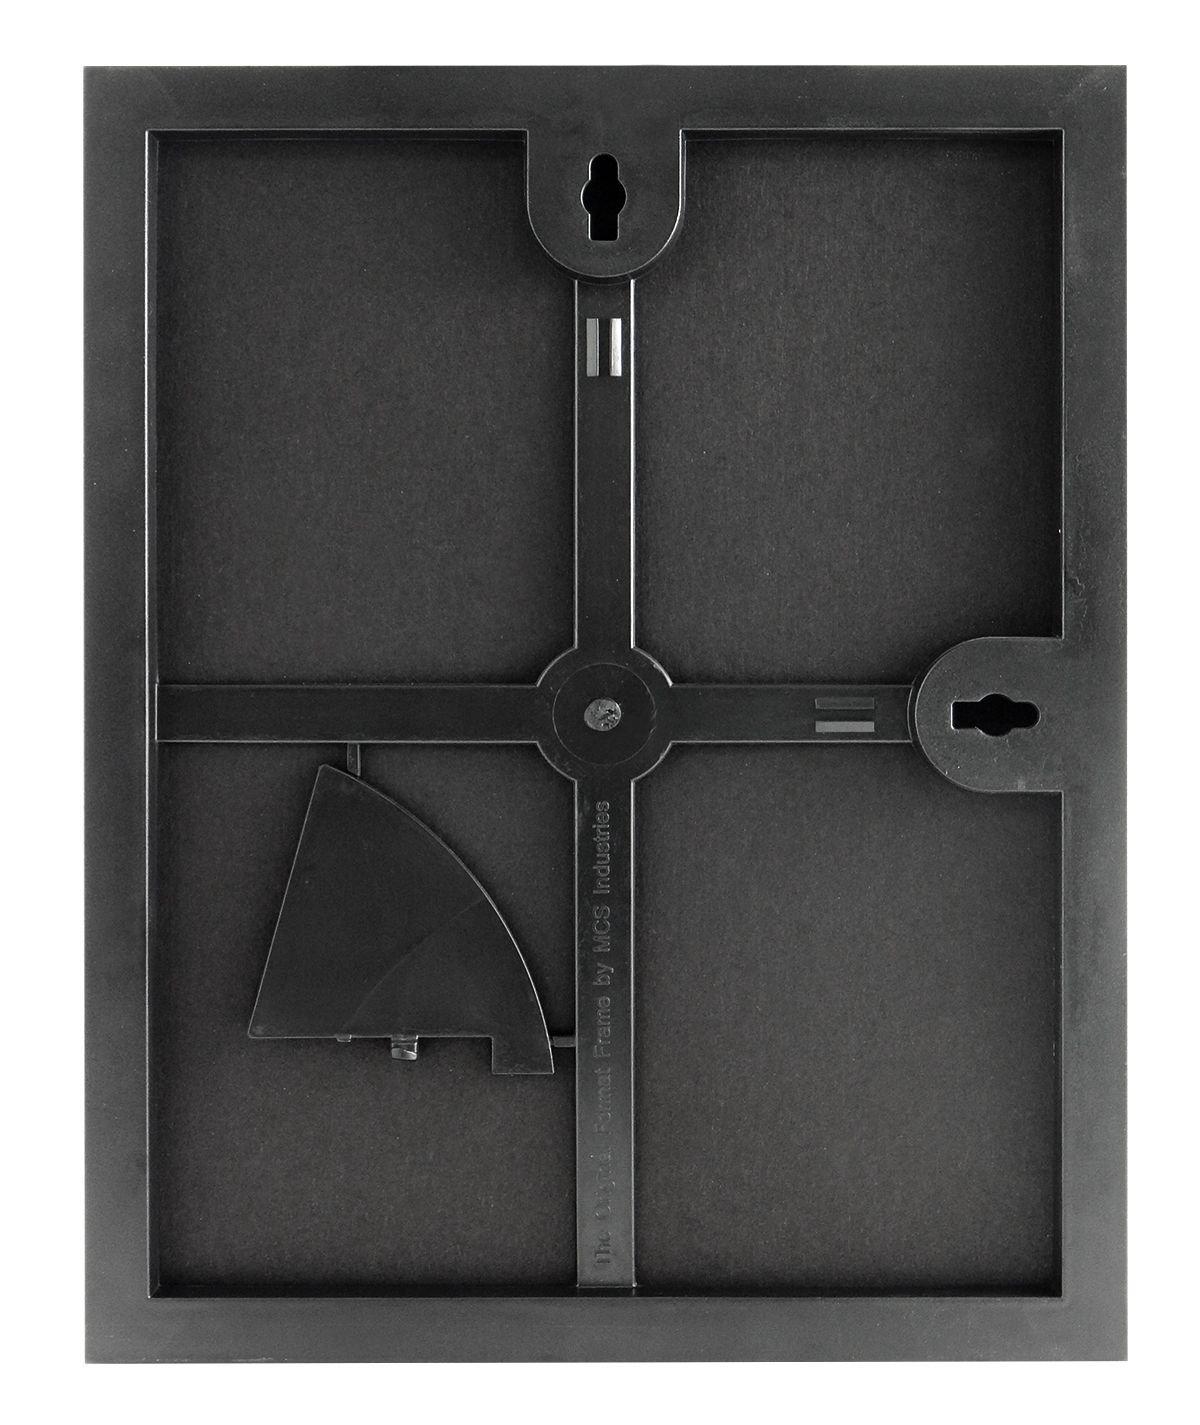 MCS 8.5x11 Inch Format Frame 6-Pack, Black (65609) by MCS (Image #4)